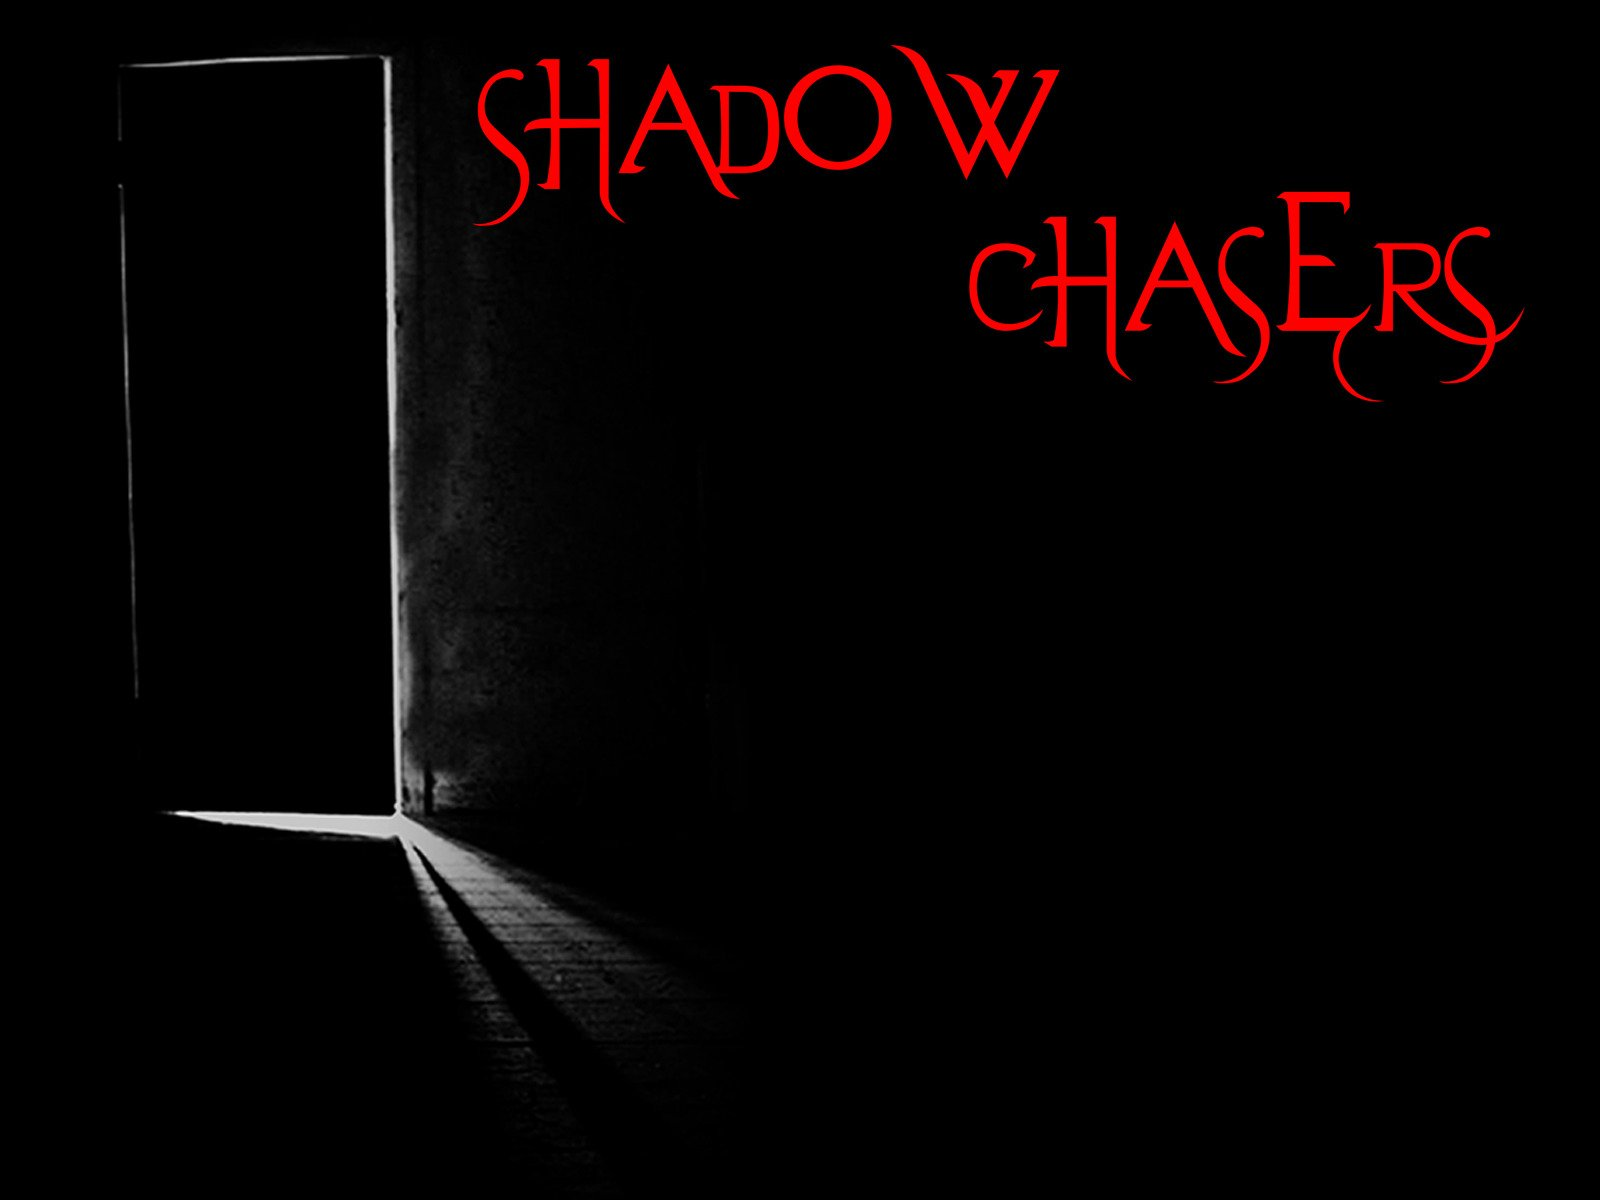 Shadow Fall (Shadowchasers)